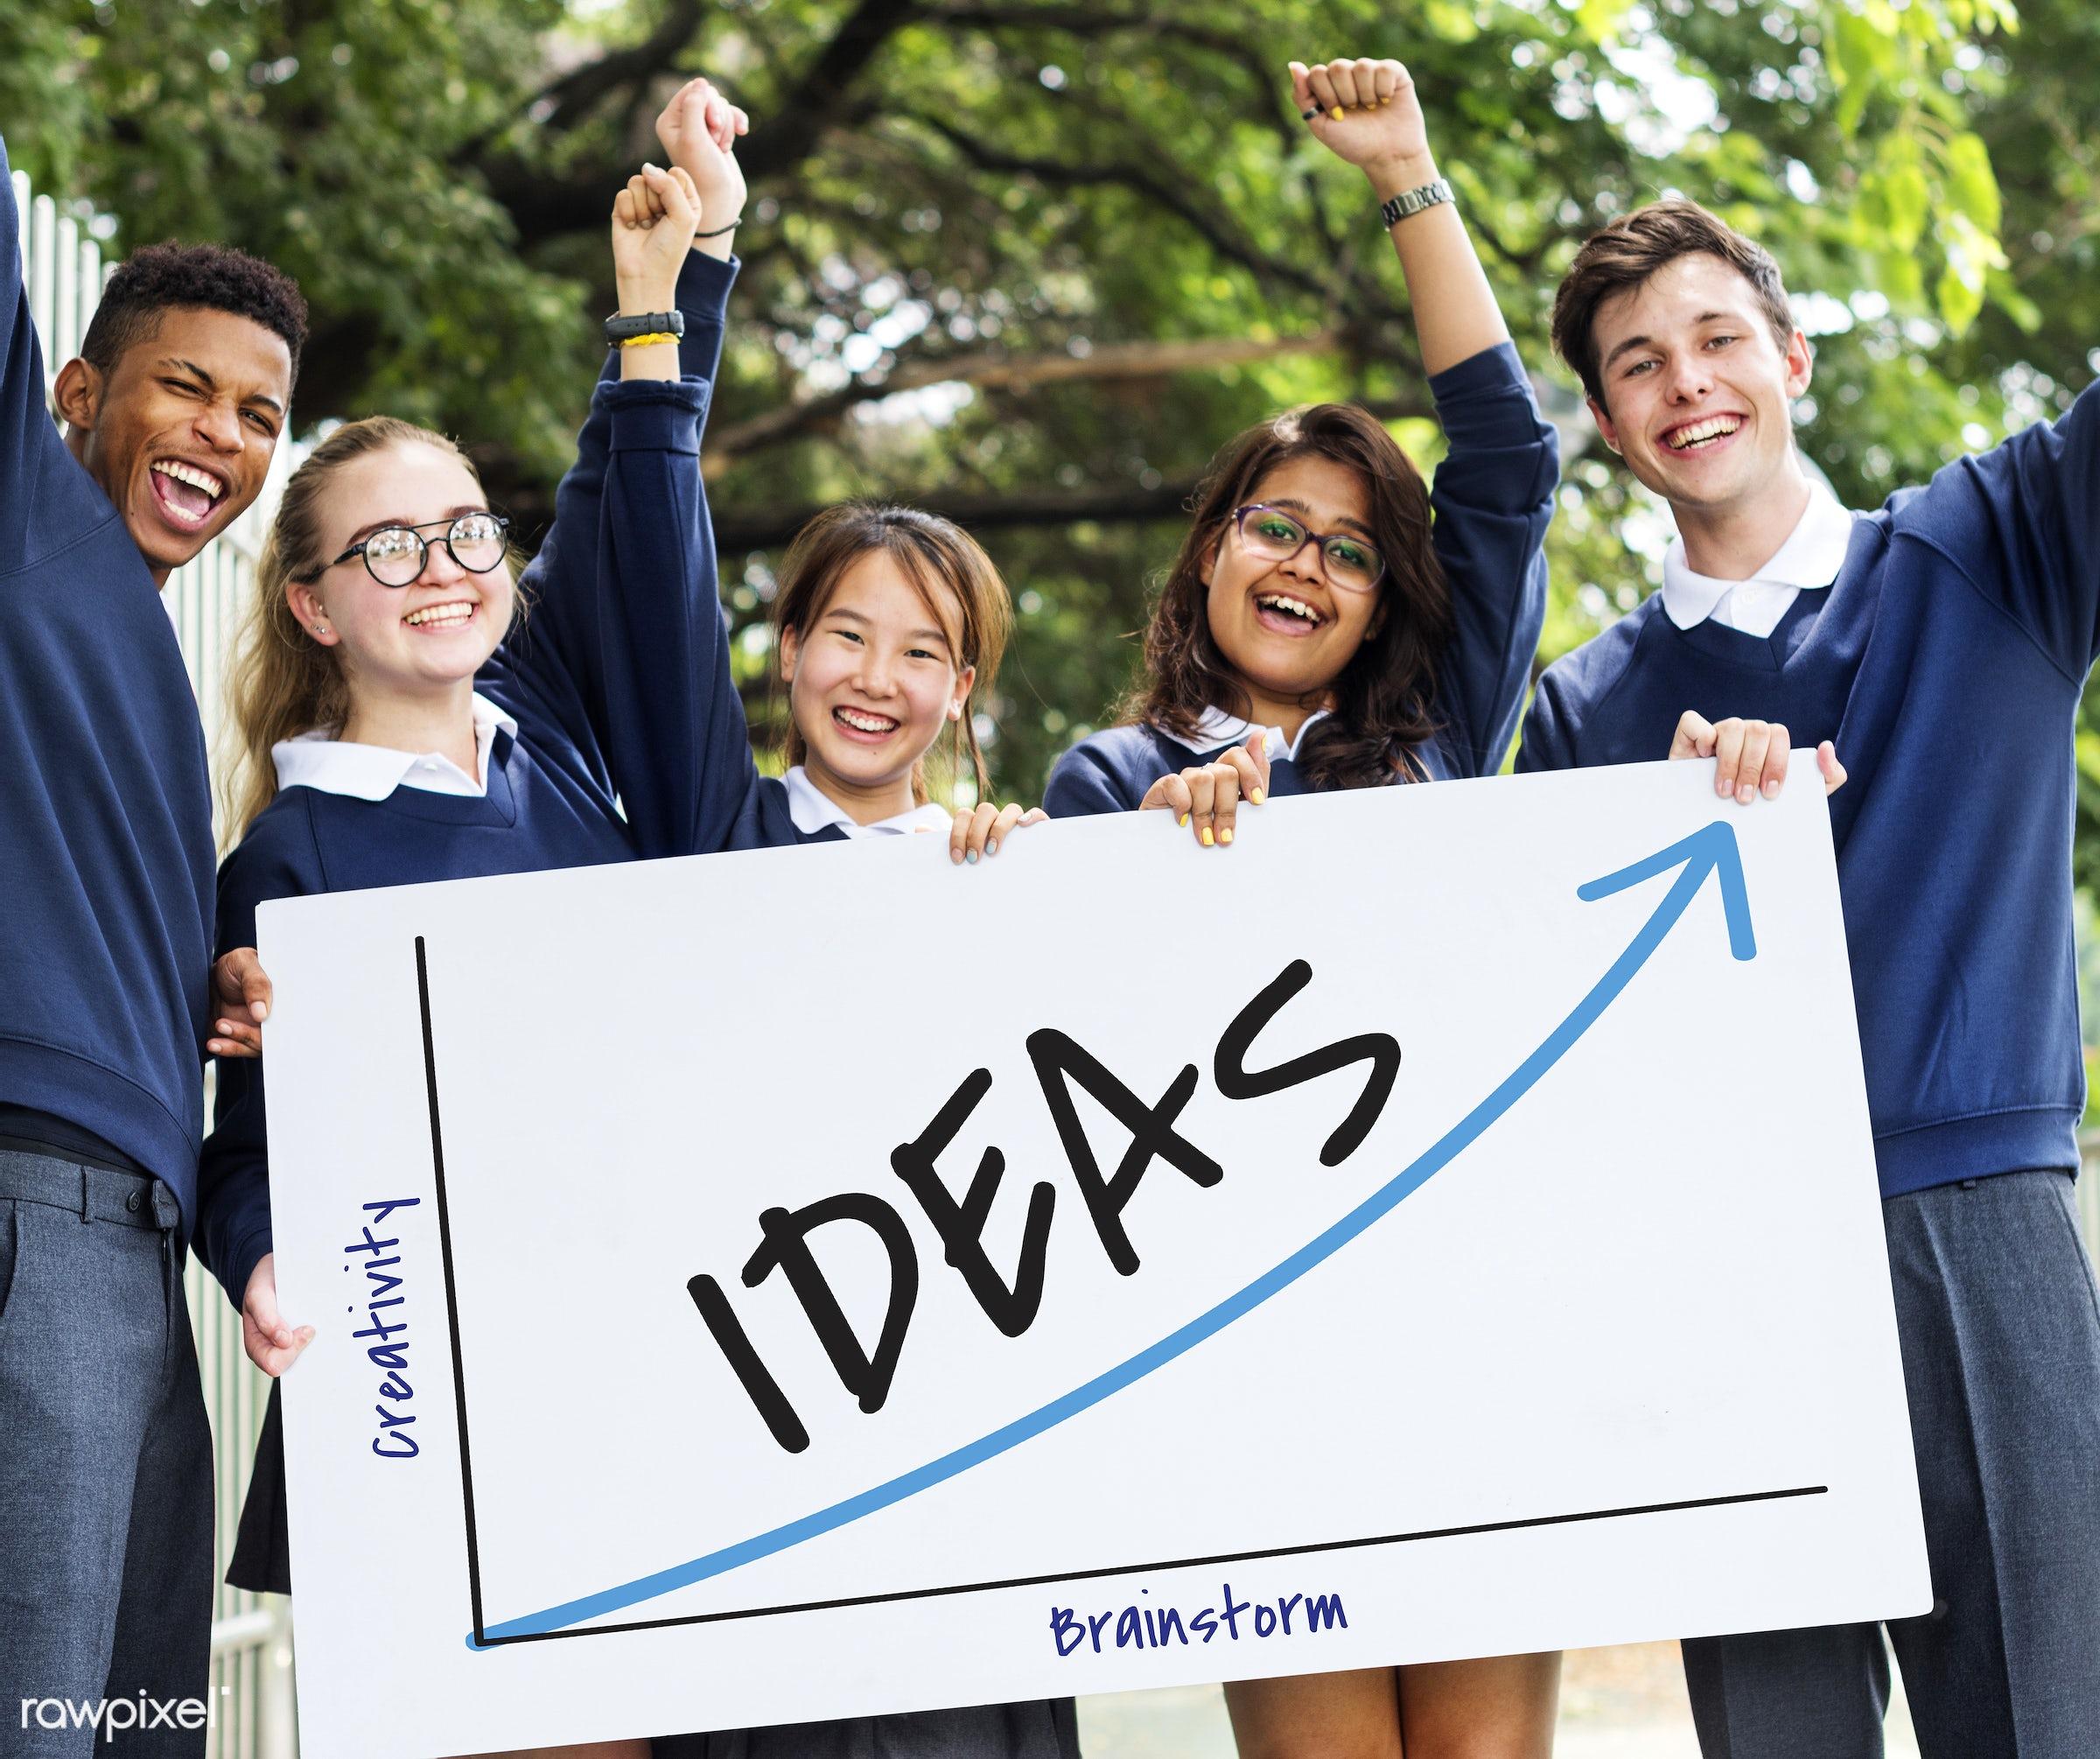 achievement, african descent, asian, aspirations, brainstorm, caucasian, creativity, direction, diversity, enjoyment,...